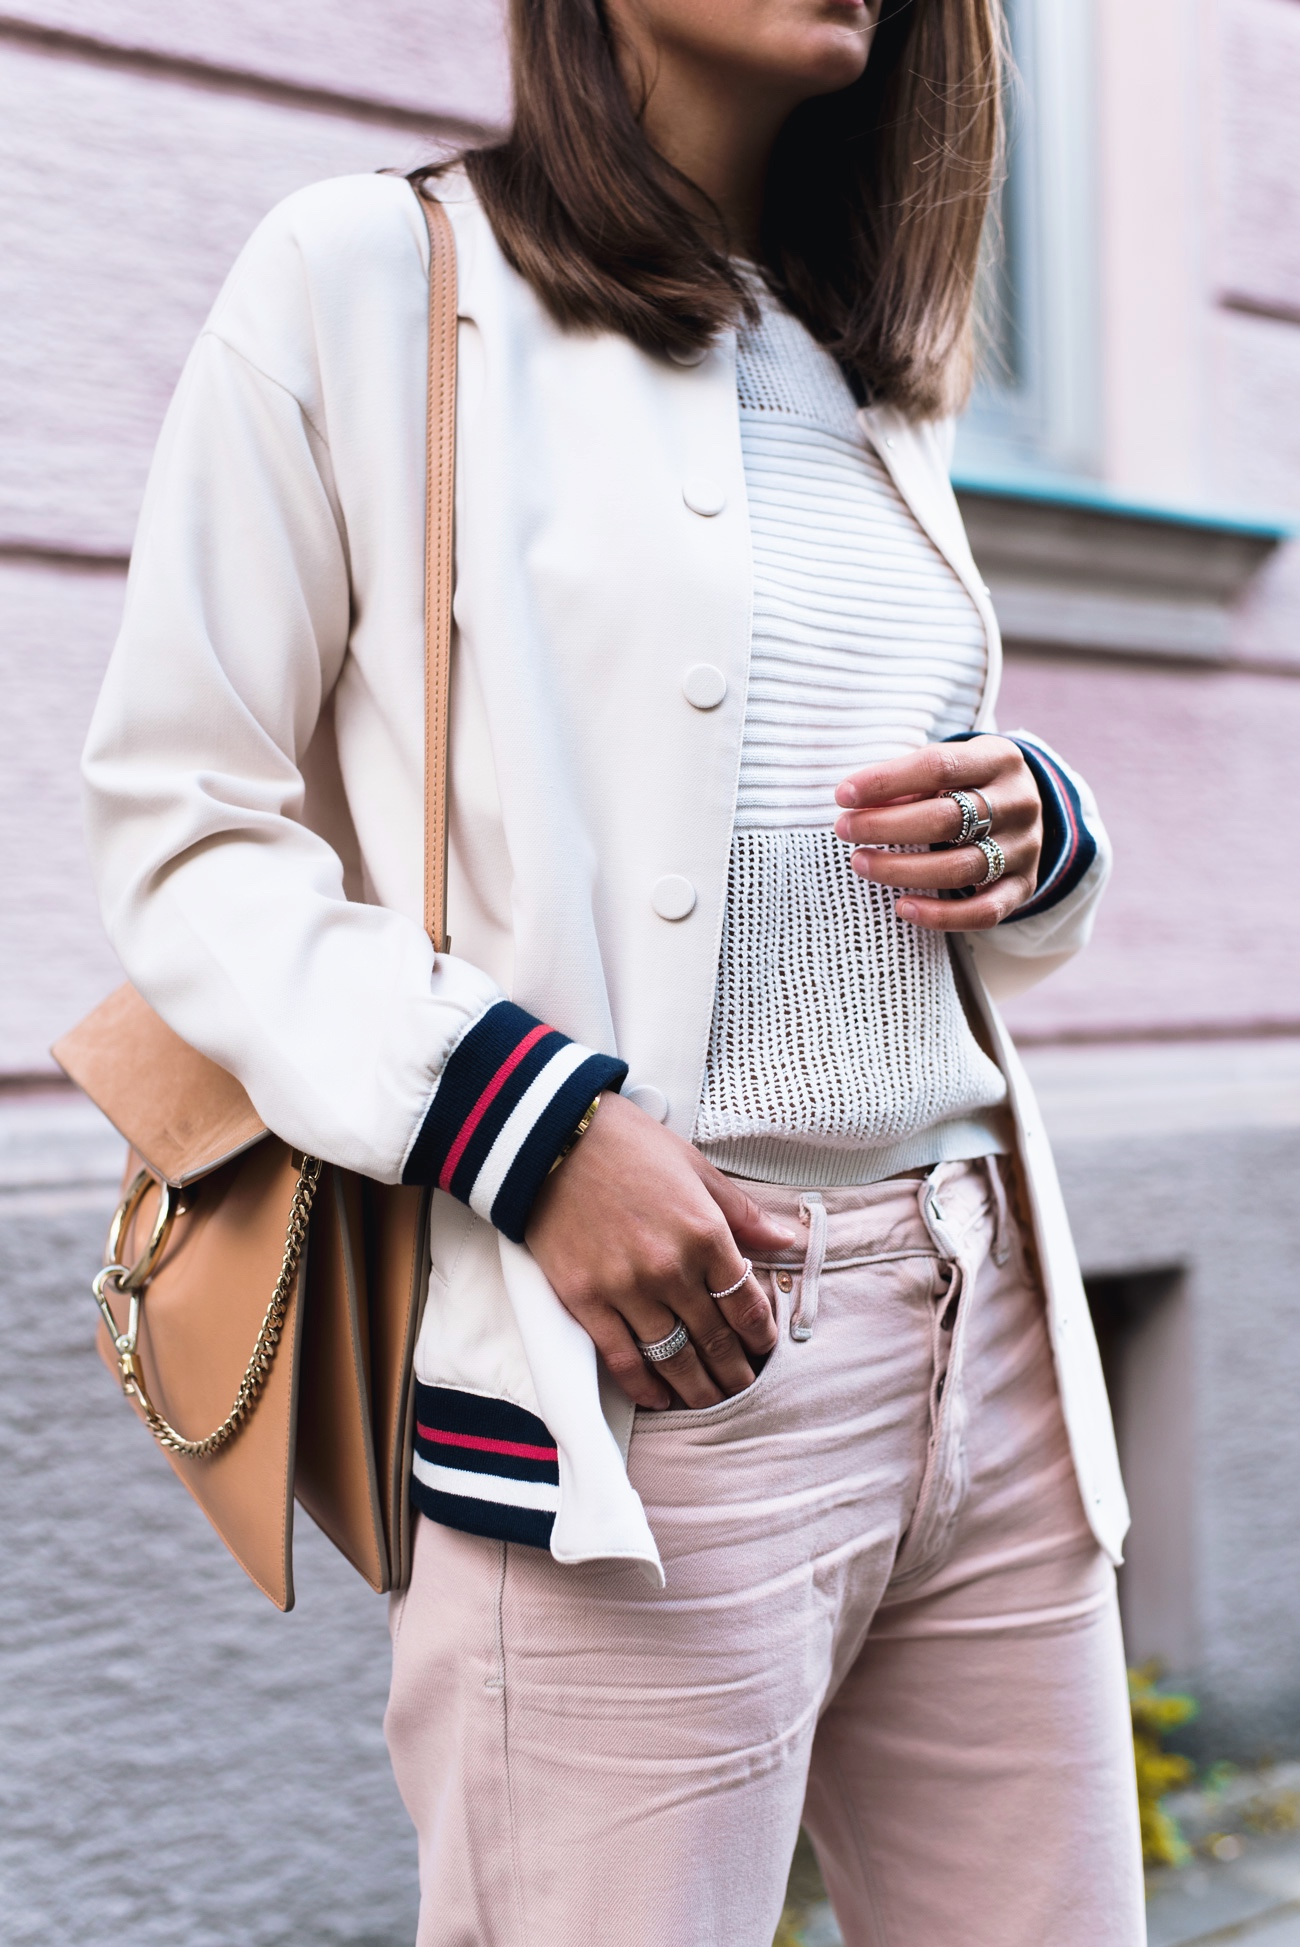 Outfit-pastell-farben-rosa-jeans-adiletten-fell-bomberjacke-nina-blogger-street-style-fashiioncarpet